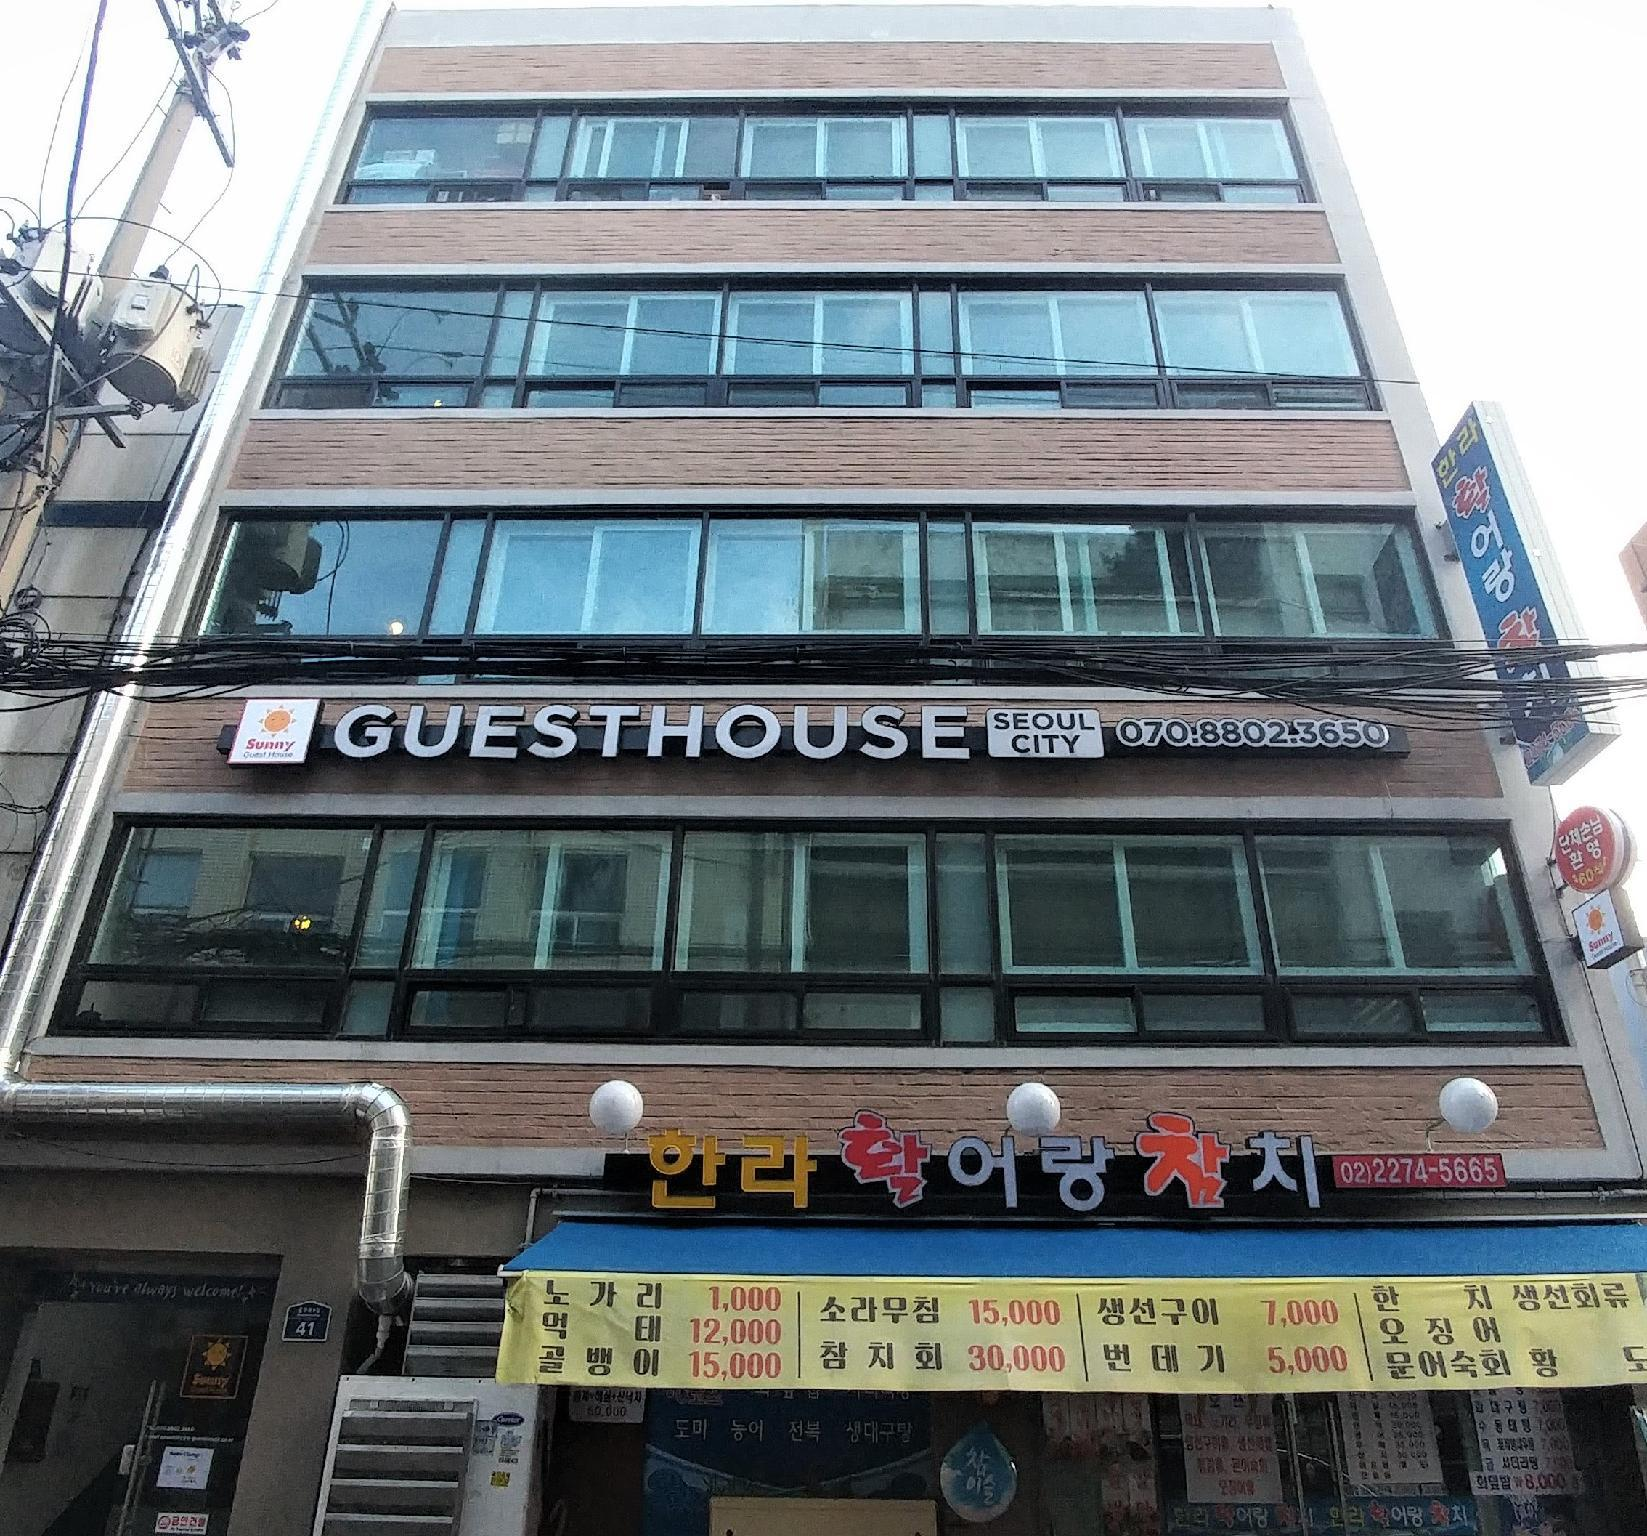 Sunny Guest House Seoul City